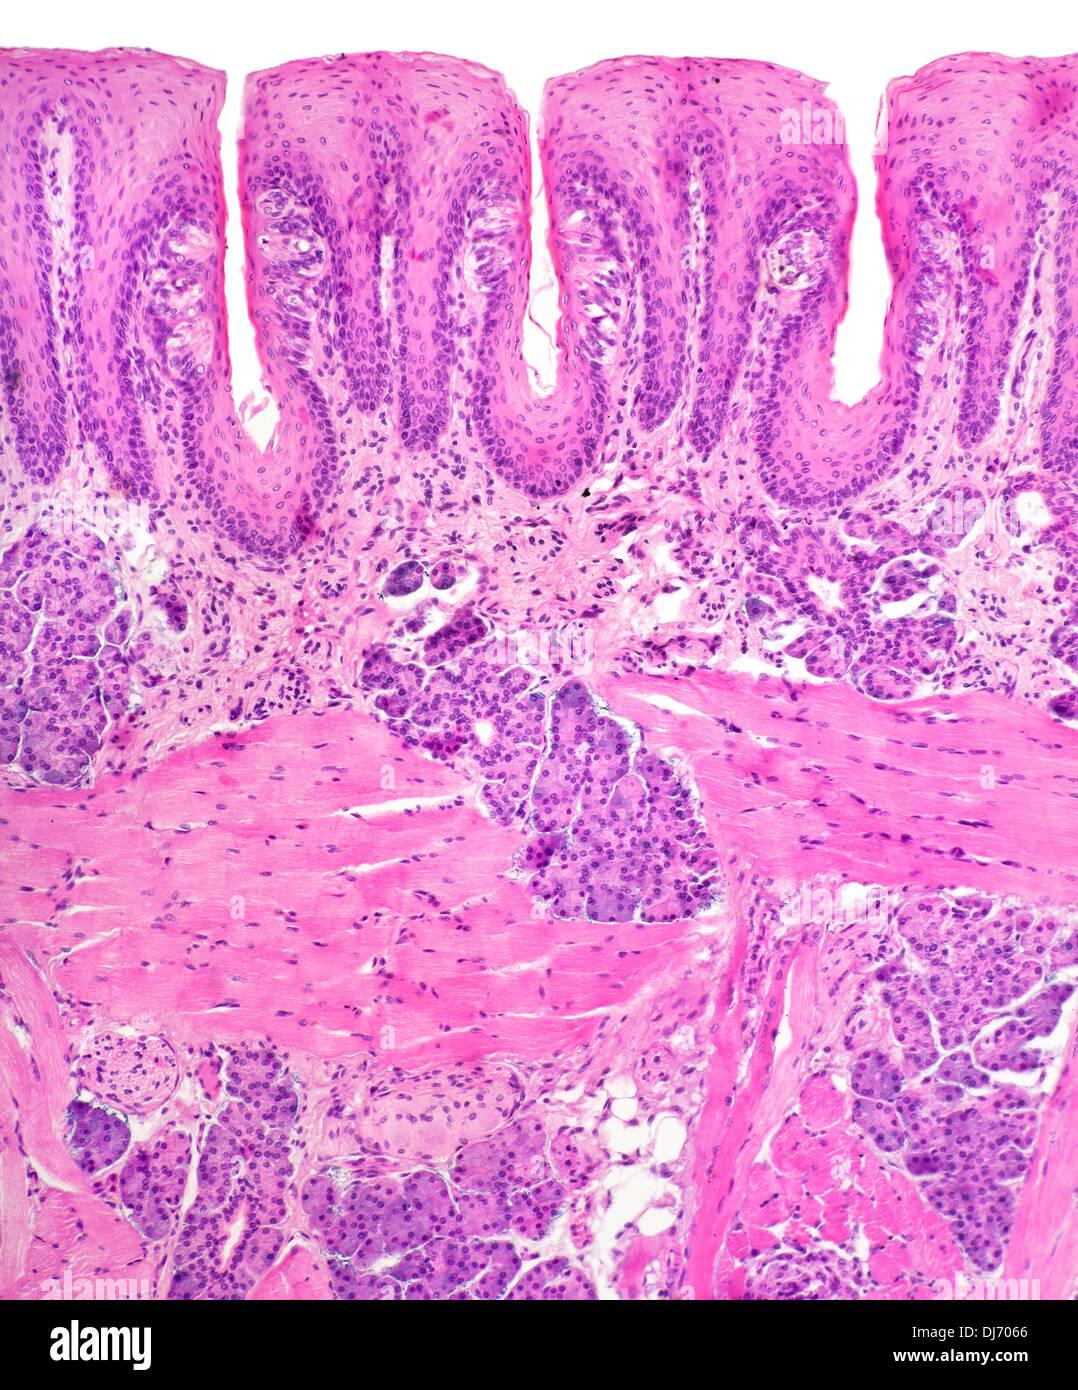 Papillae Taste Buds Human Tongue Bright Field Photomicrograph